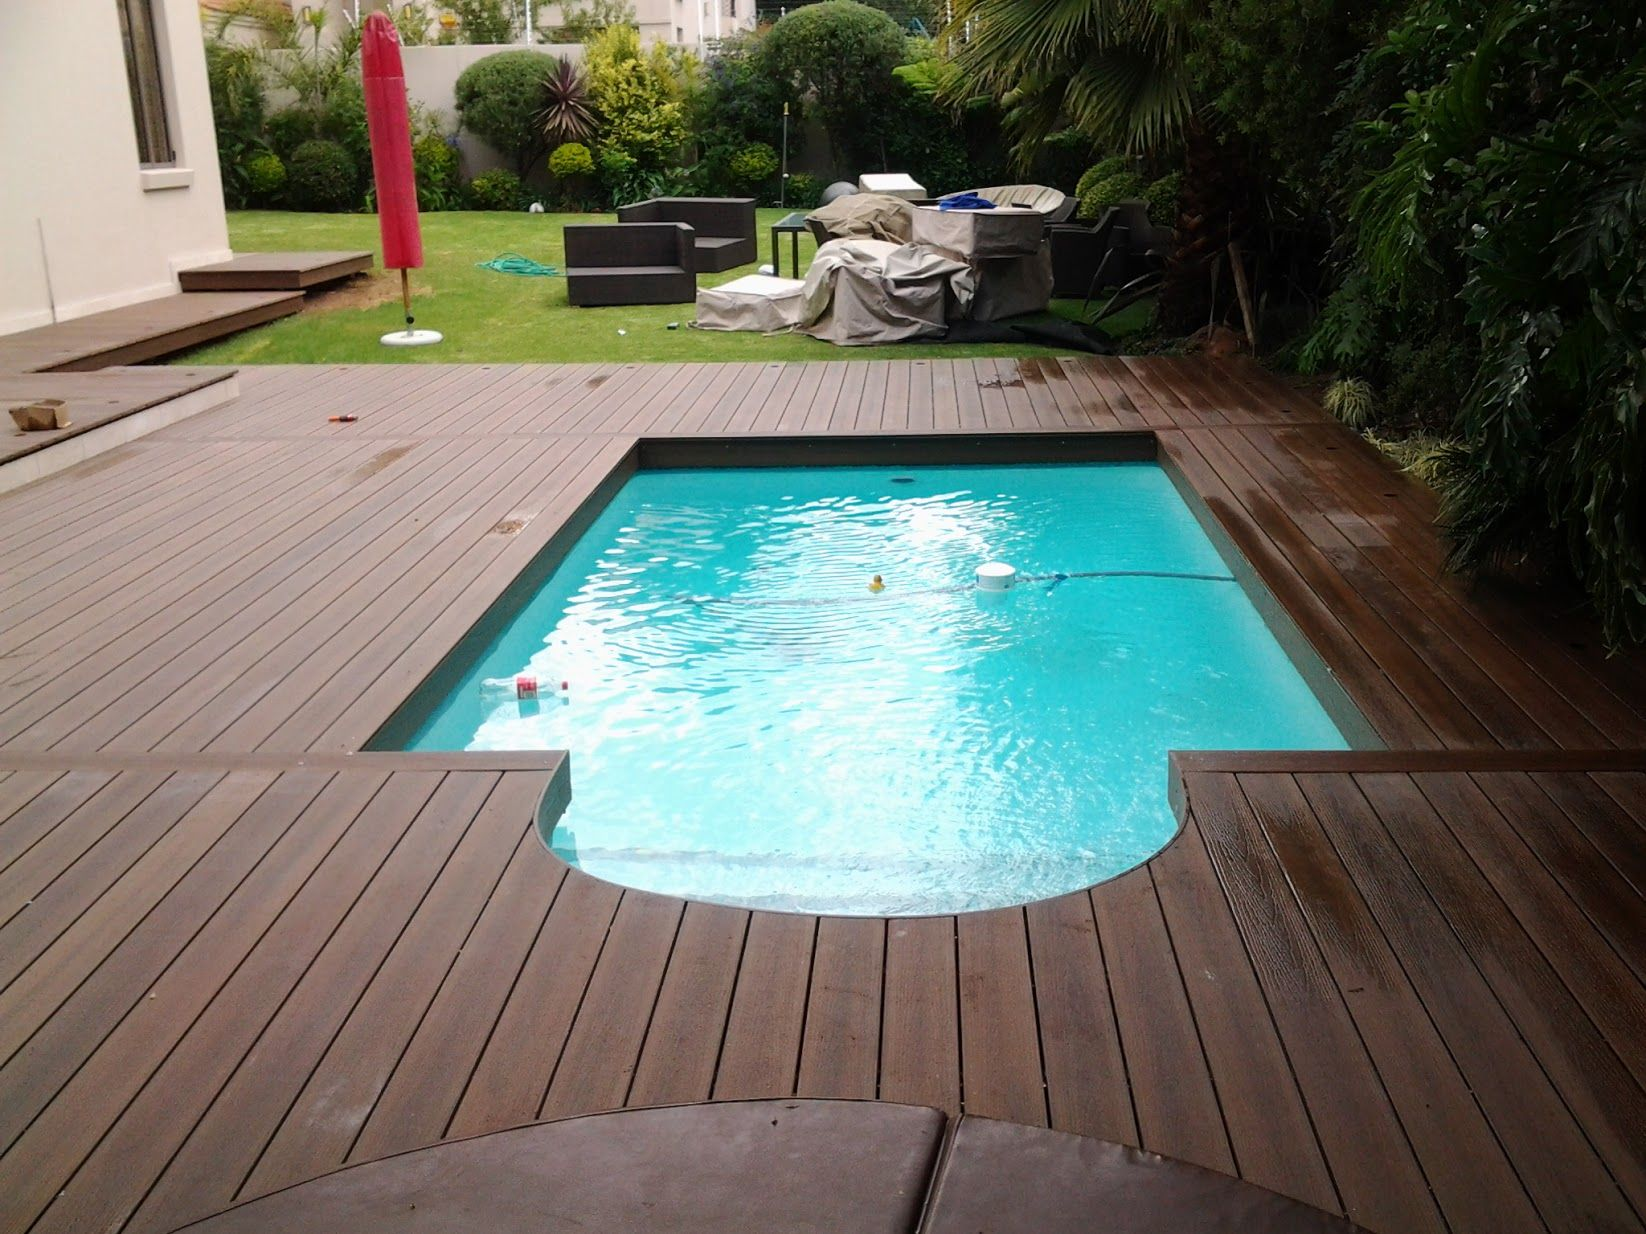 Eva Tech Infinity Deck Around Pool Decks Around Pools Wooden Pool Deck Pool Decks